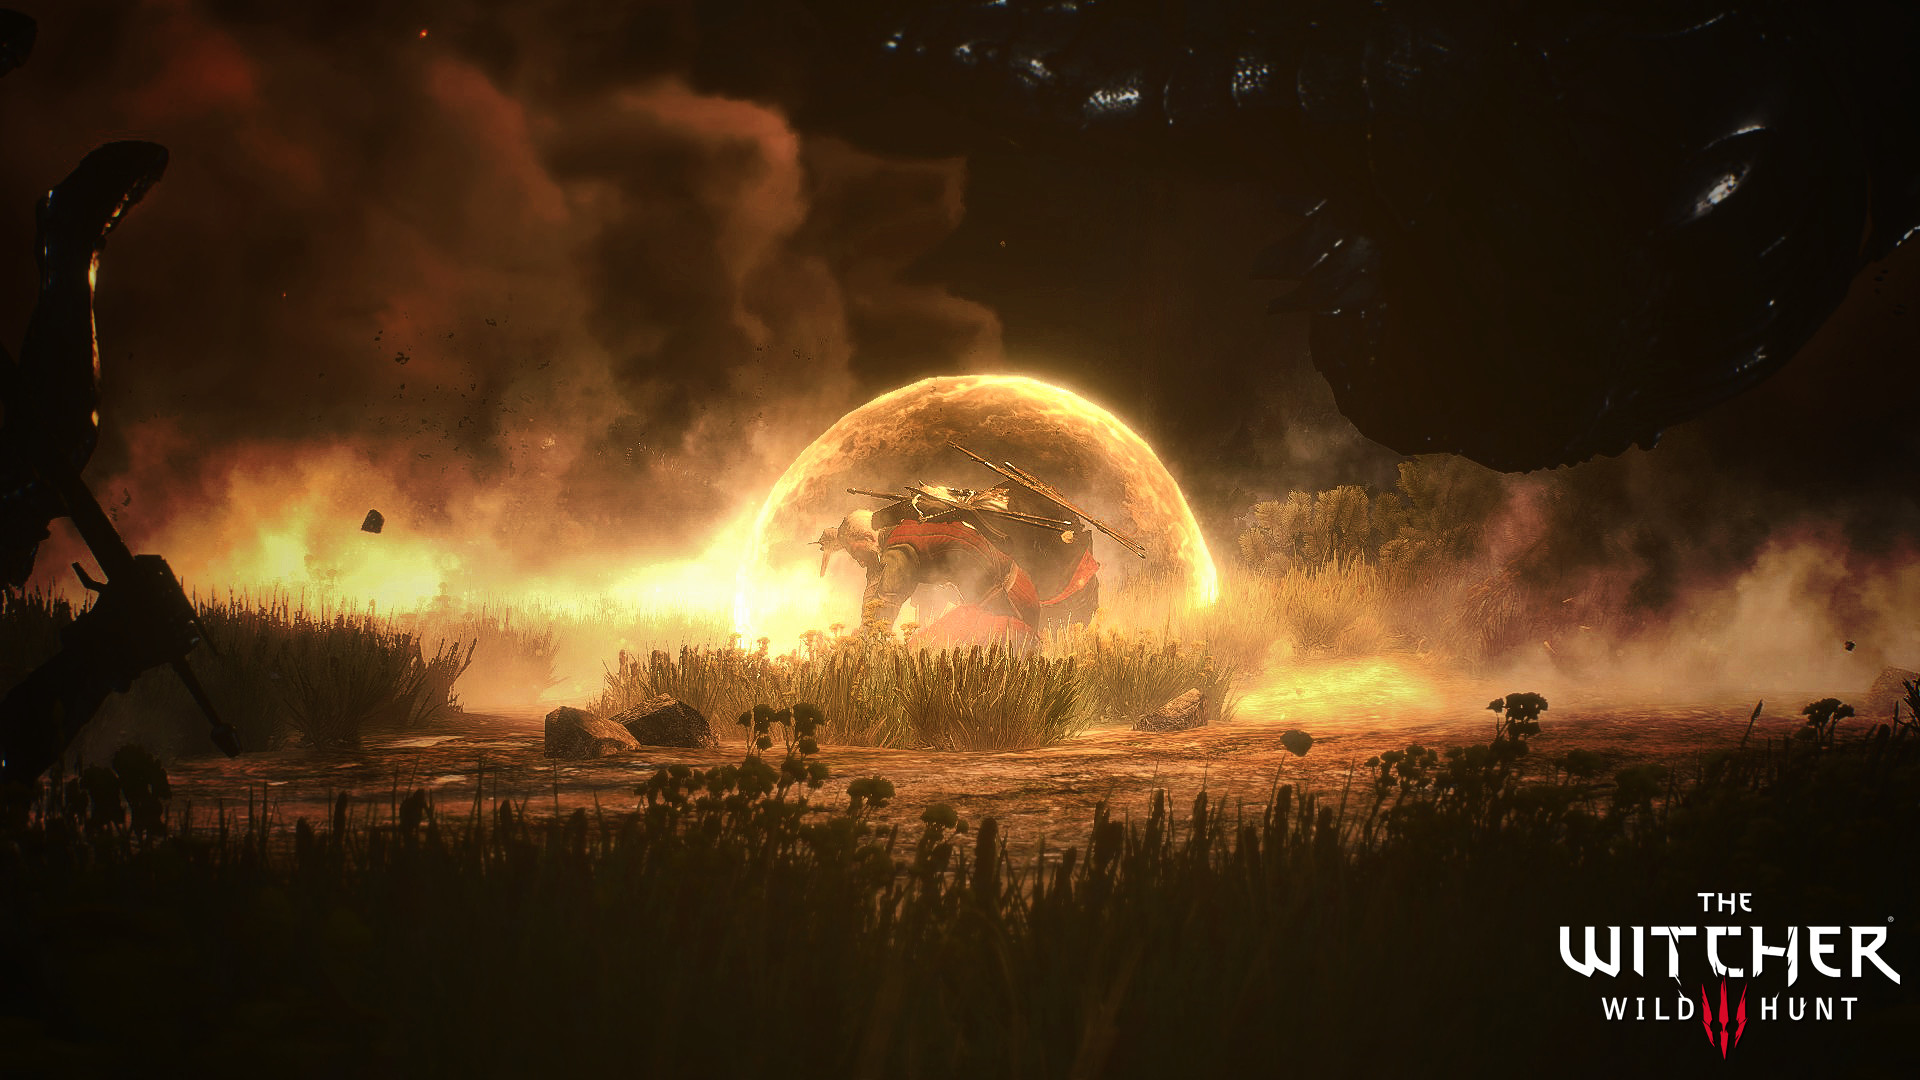 … Witcher 3 Wallpaper Kaer Morhen Battle by Jarminx